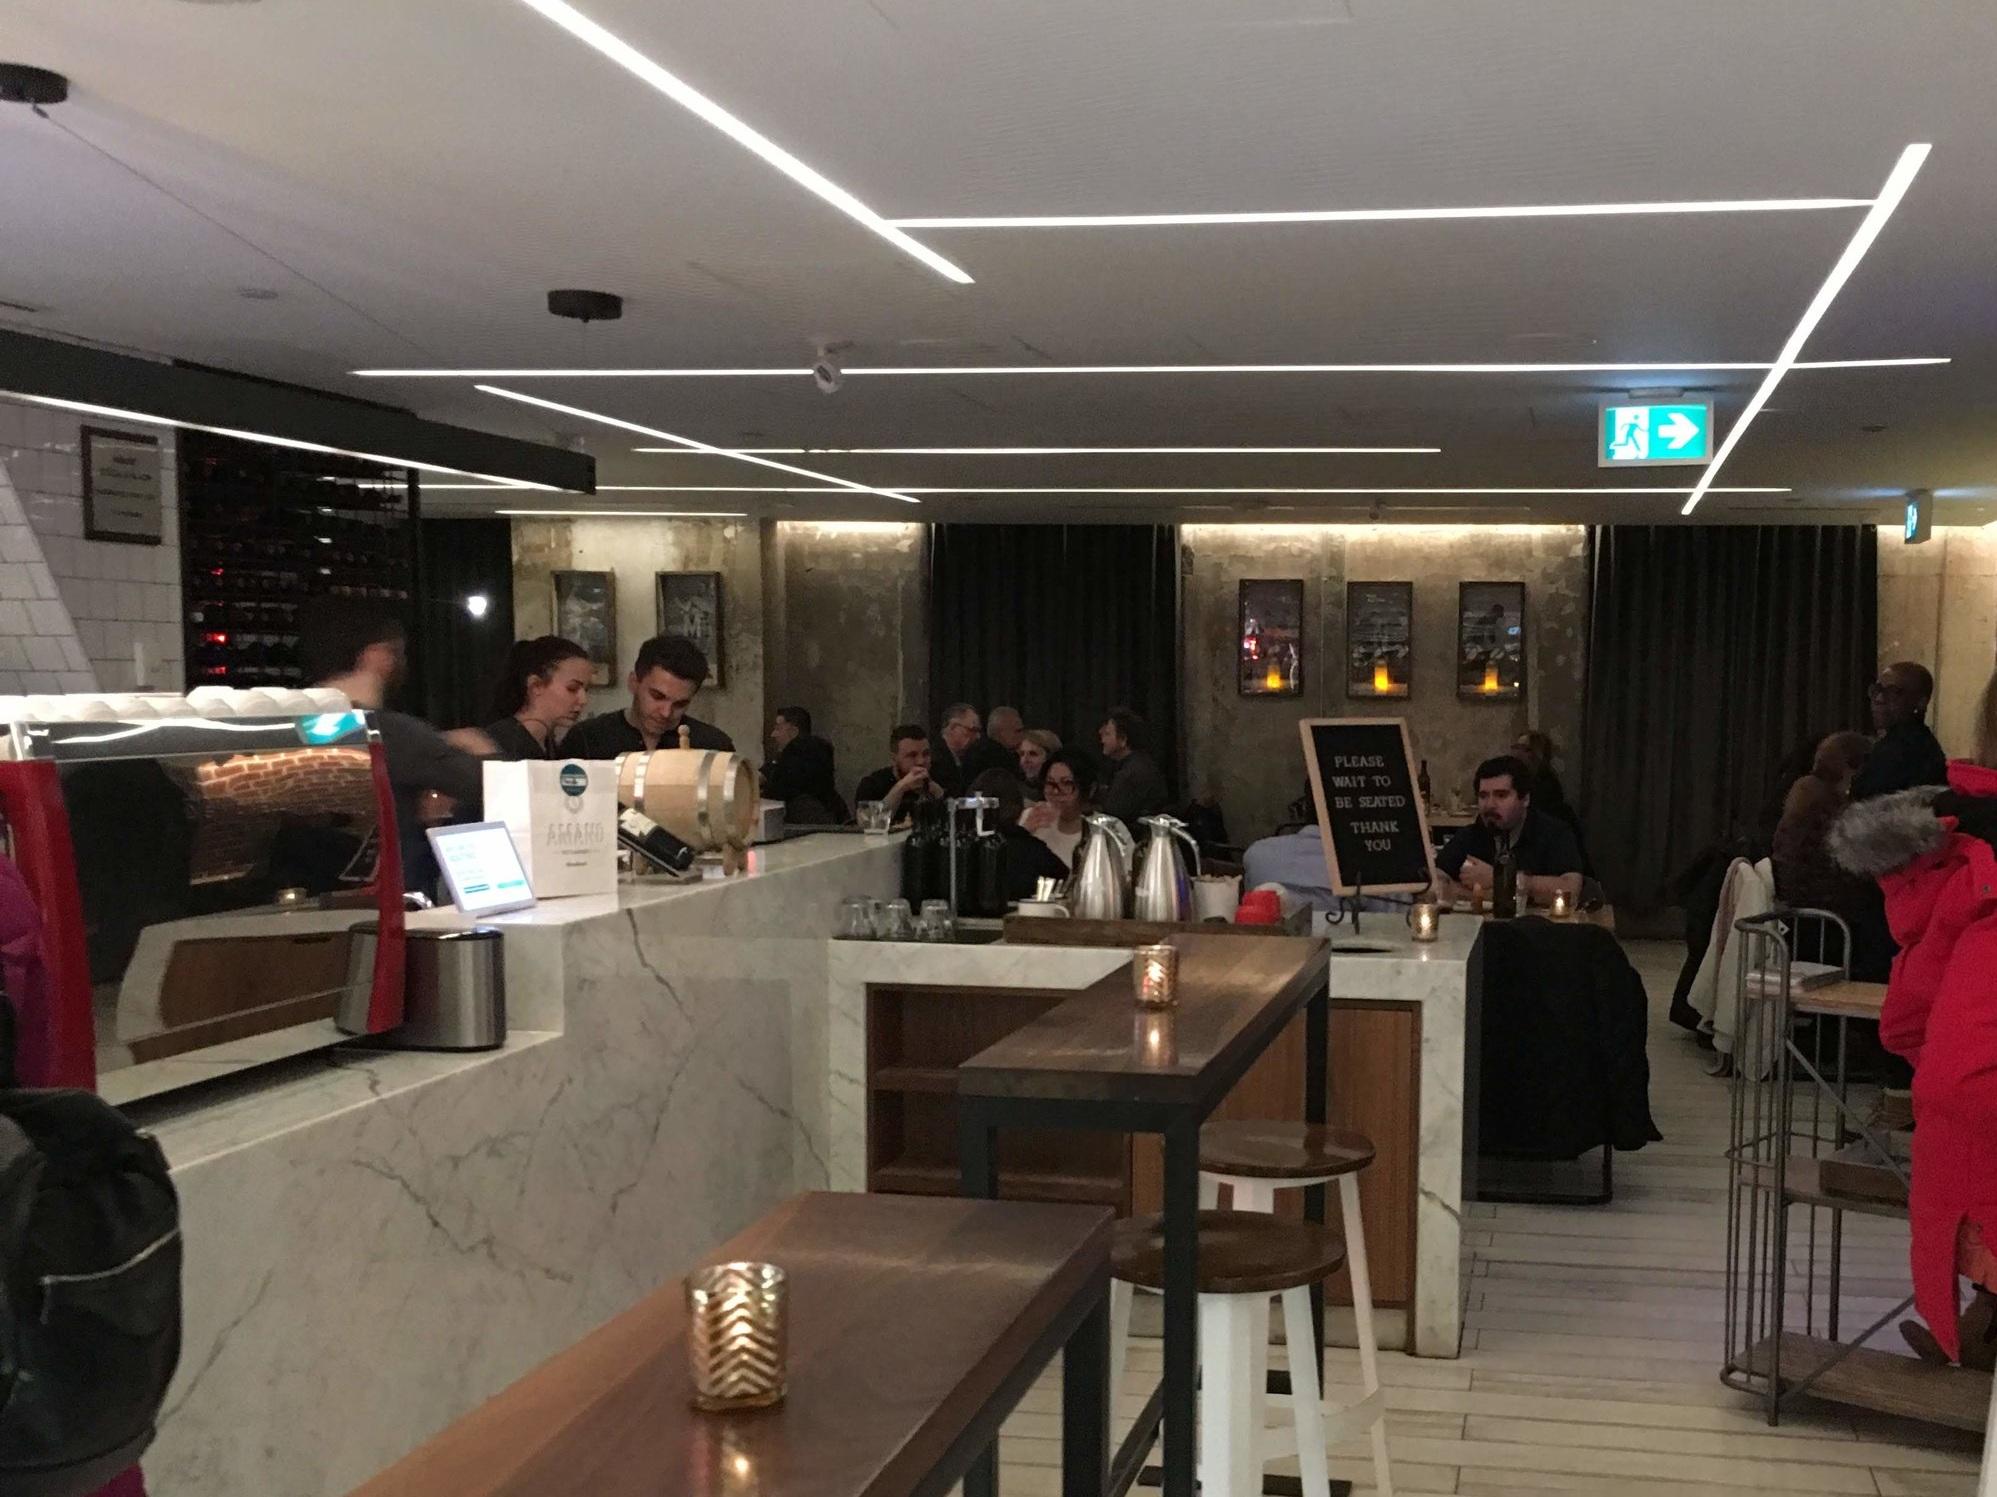 Picture of pasta bar and bar seating at Amano Pasta